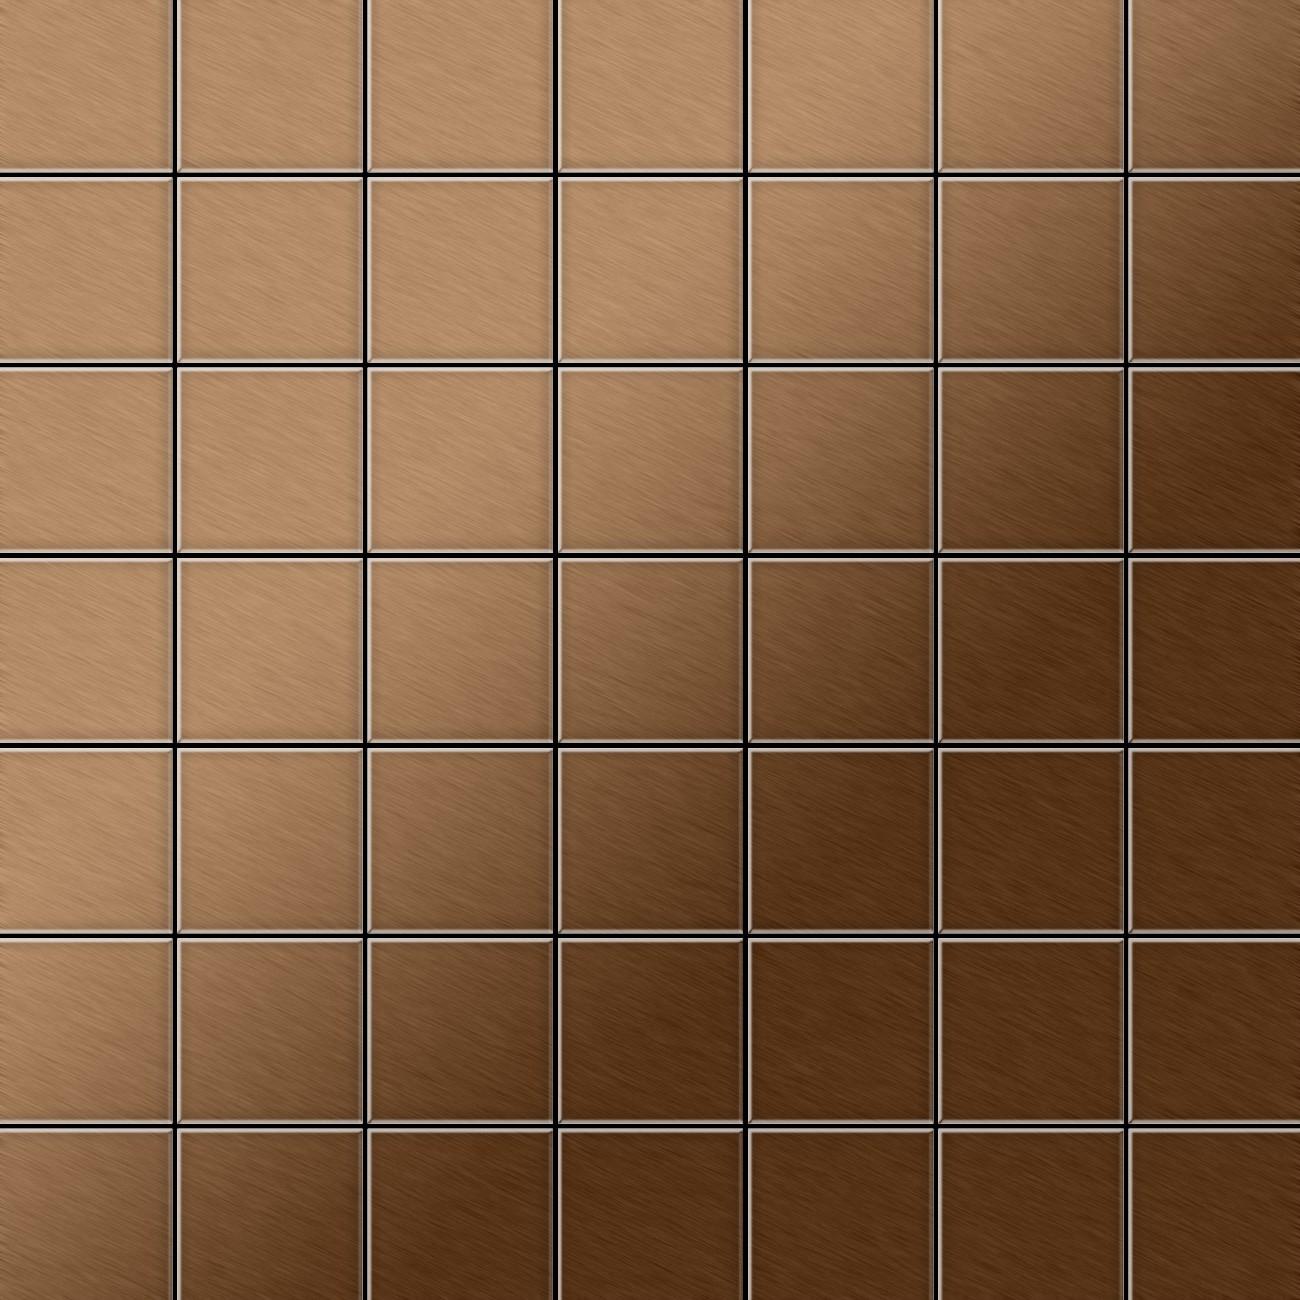 Azulejo mosaico de metal s lido titanio amber cepillado for Azulejo mosaico